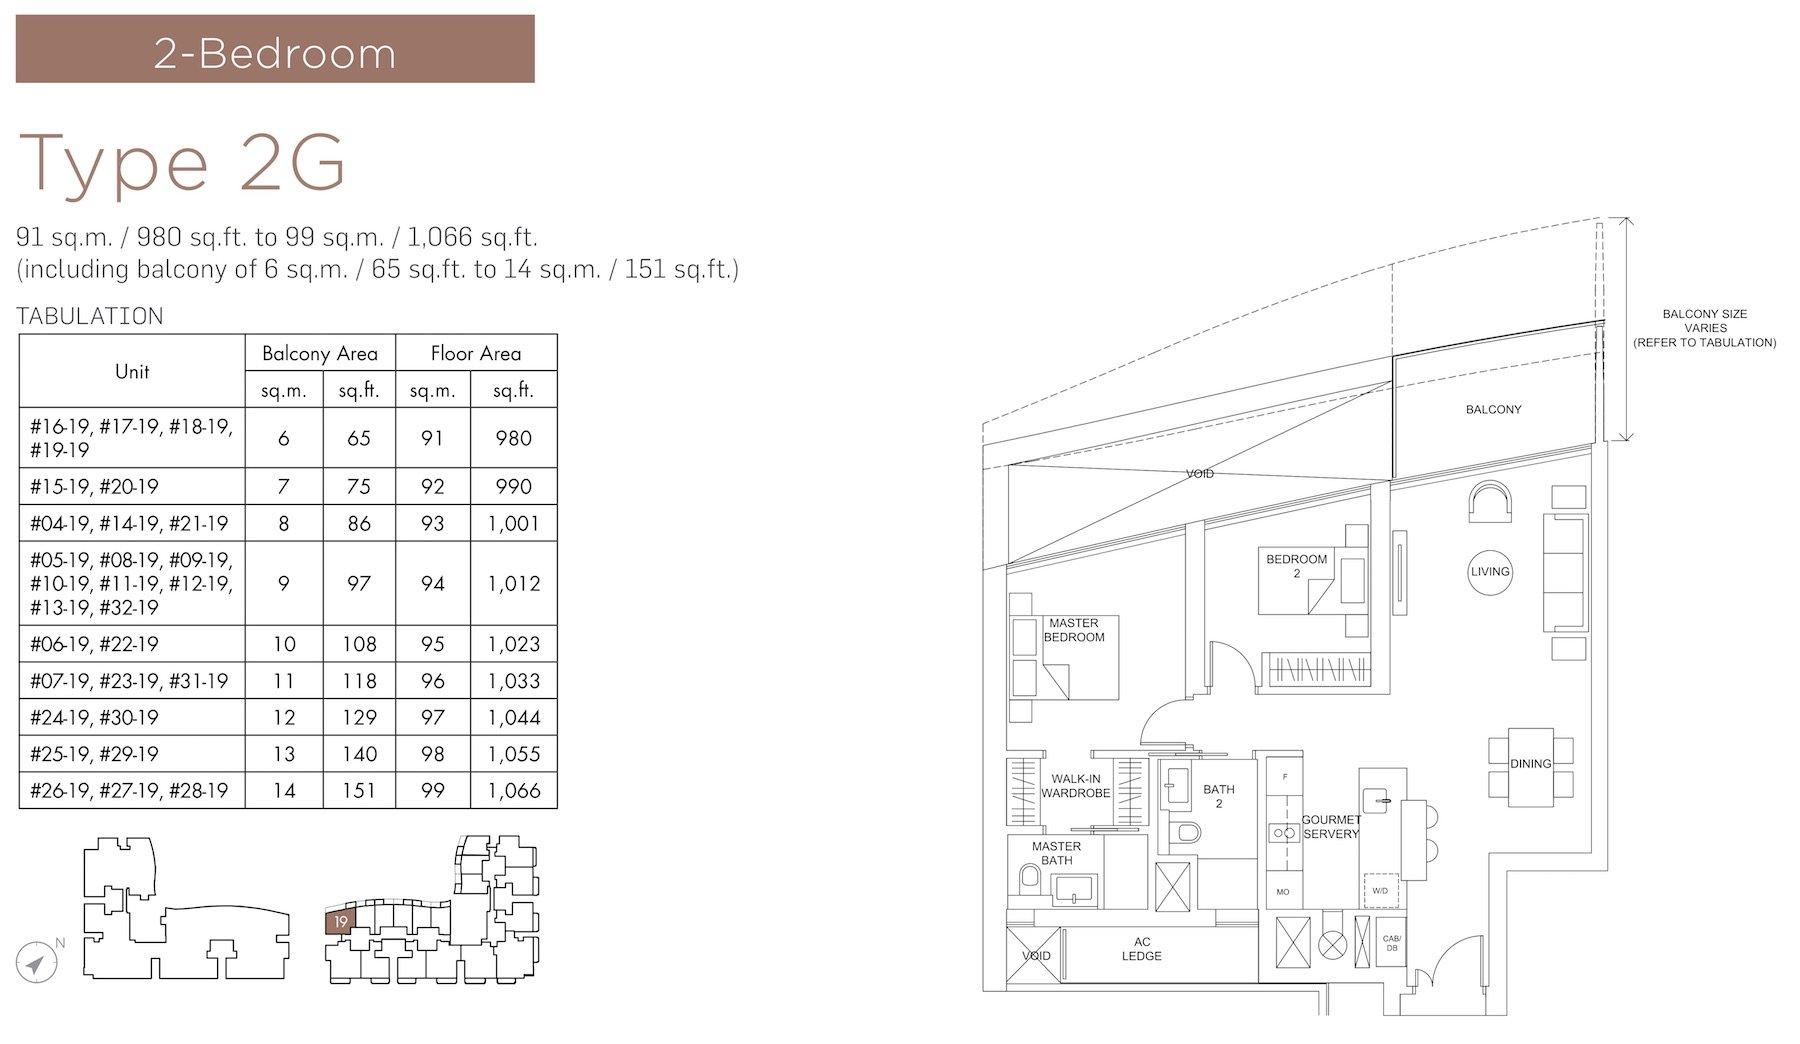 Marina One Residences 滨海盛景豪苑 floor plans 2 bedroom 2G